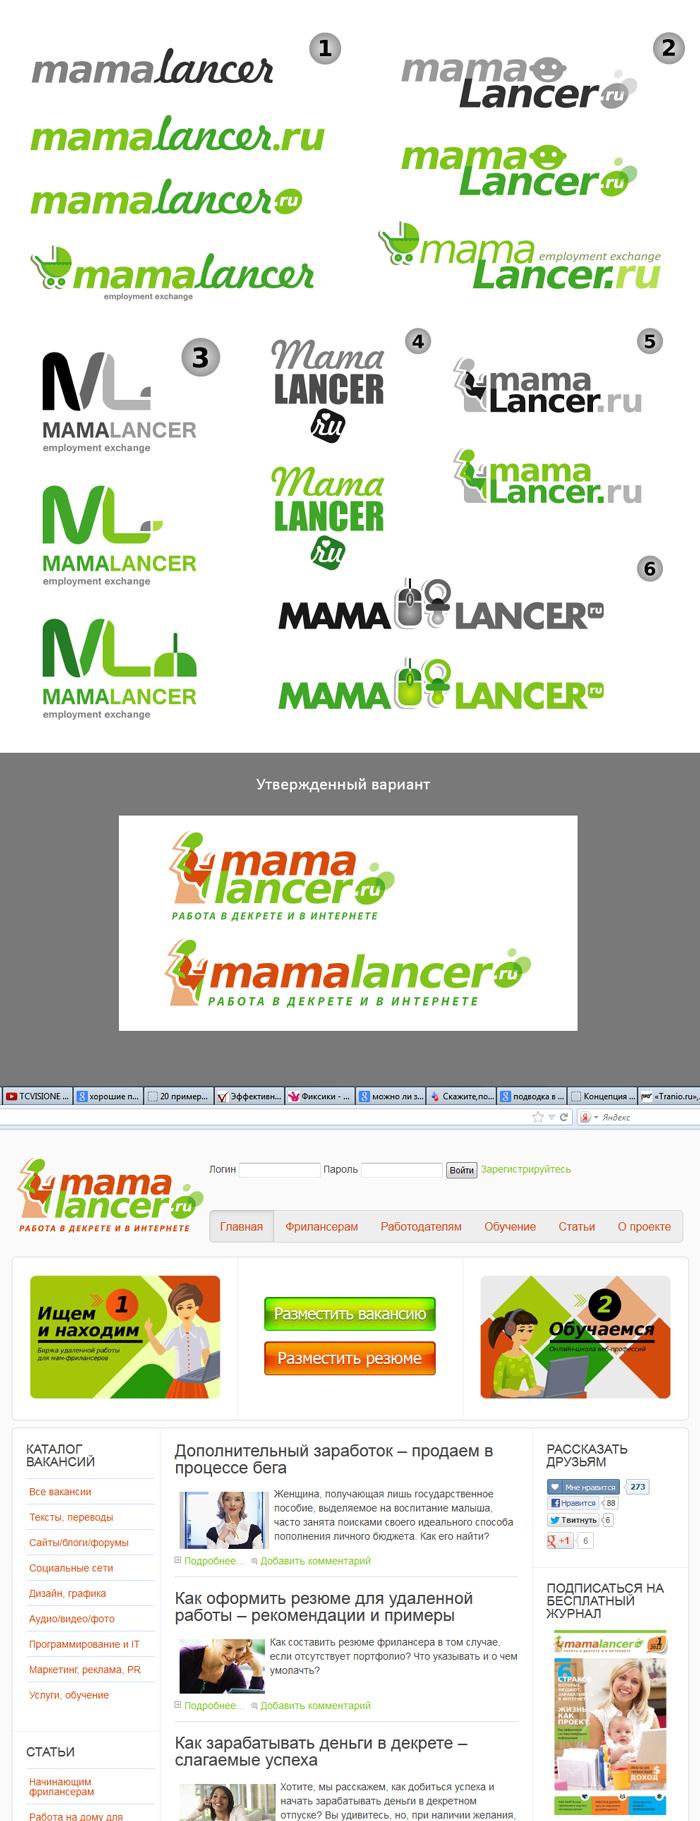 Логотип для проекта MamaLancer.ru